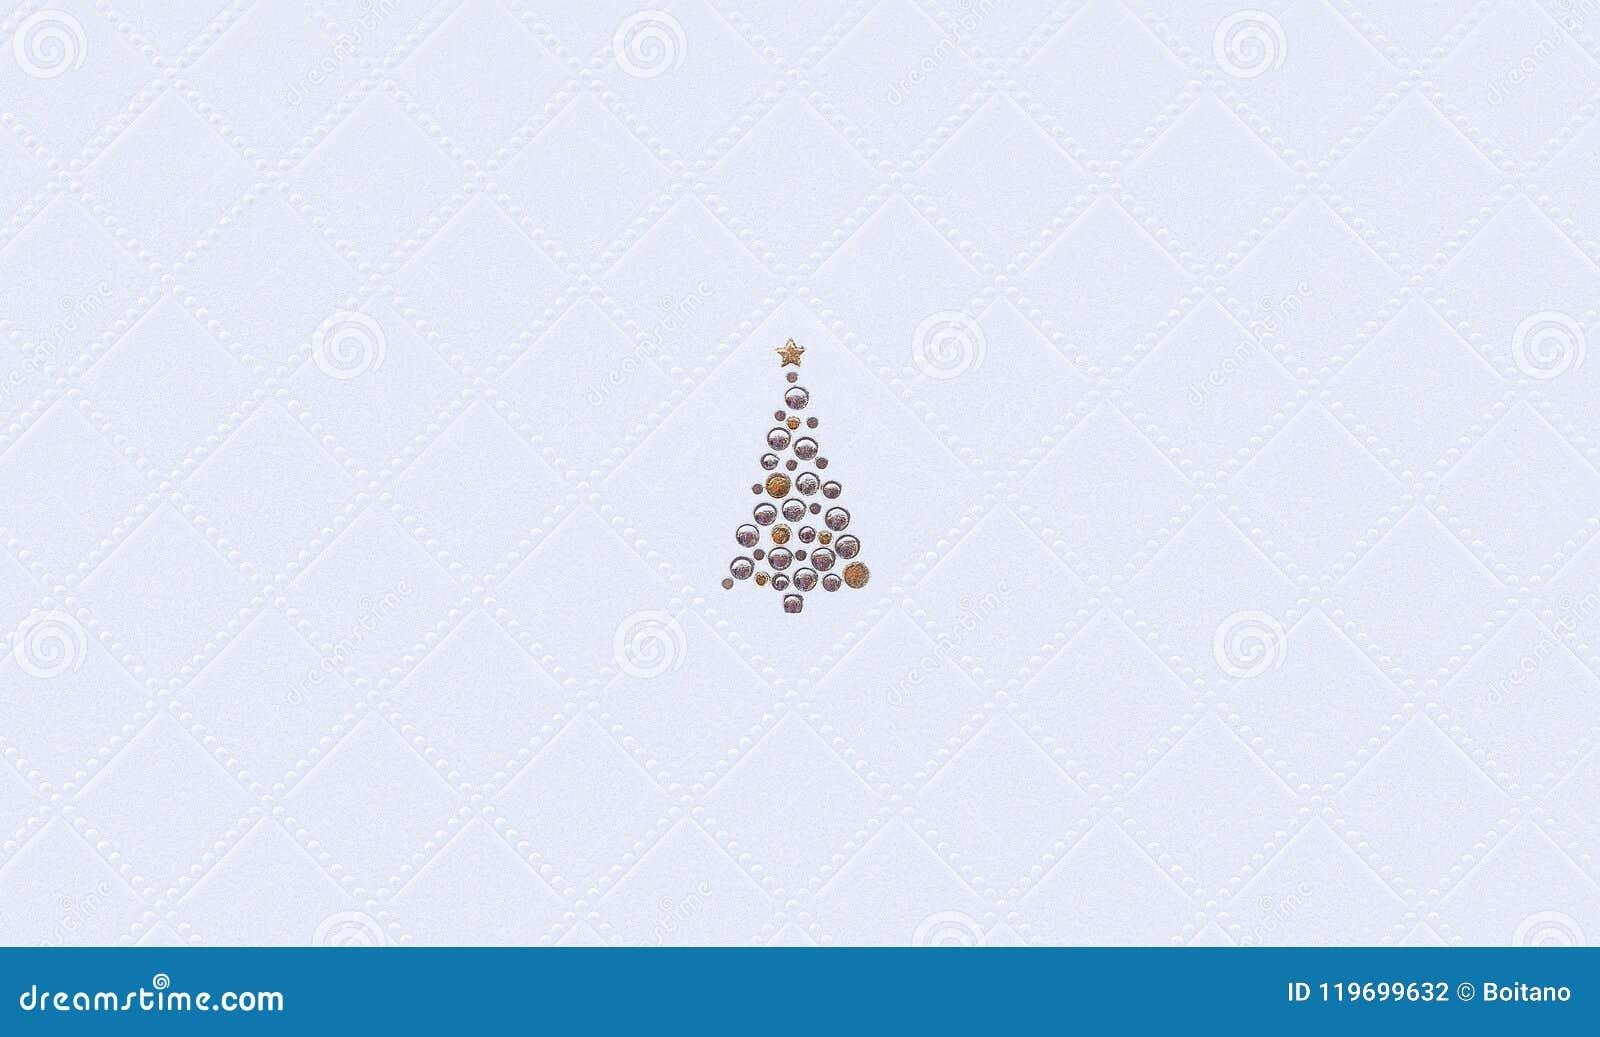 decorated christmas tree wallpaper winter holiday background xmas motive white 119699632